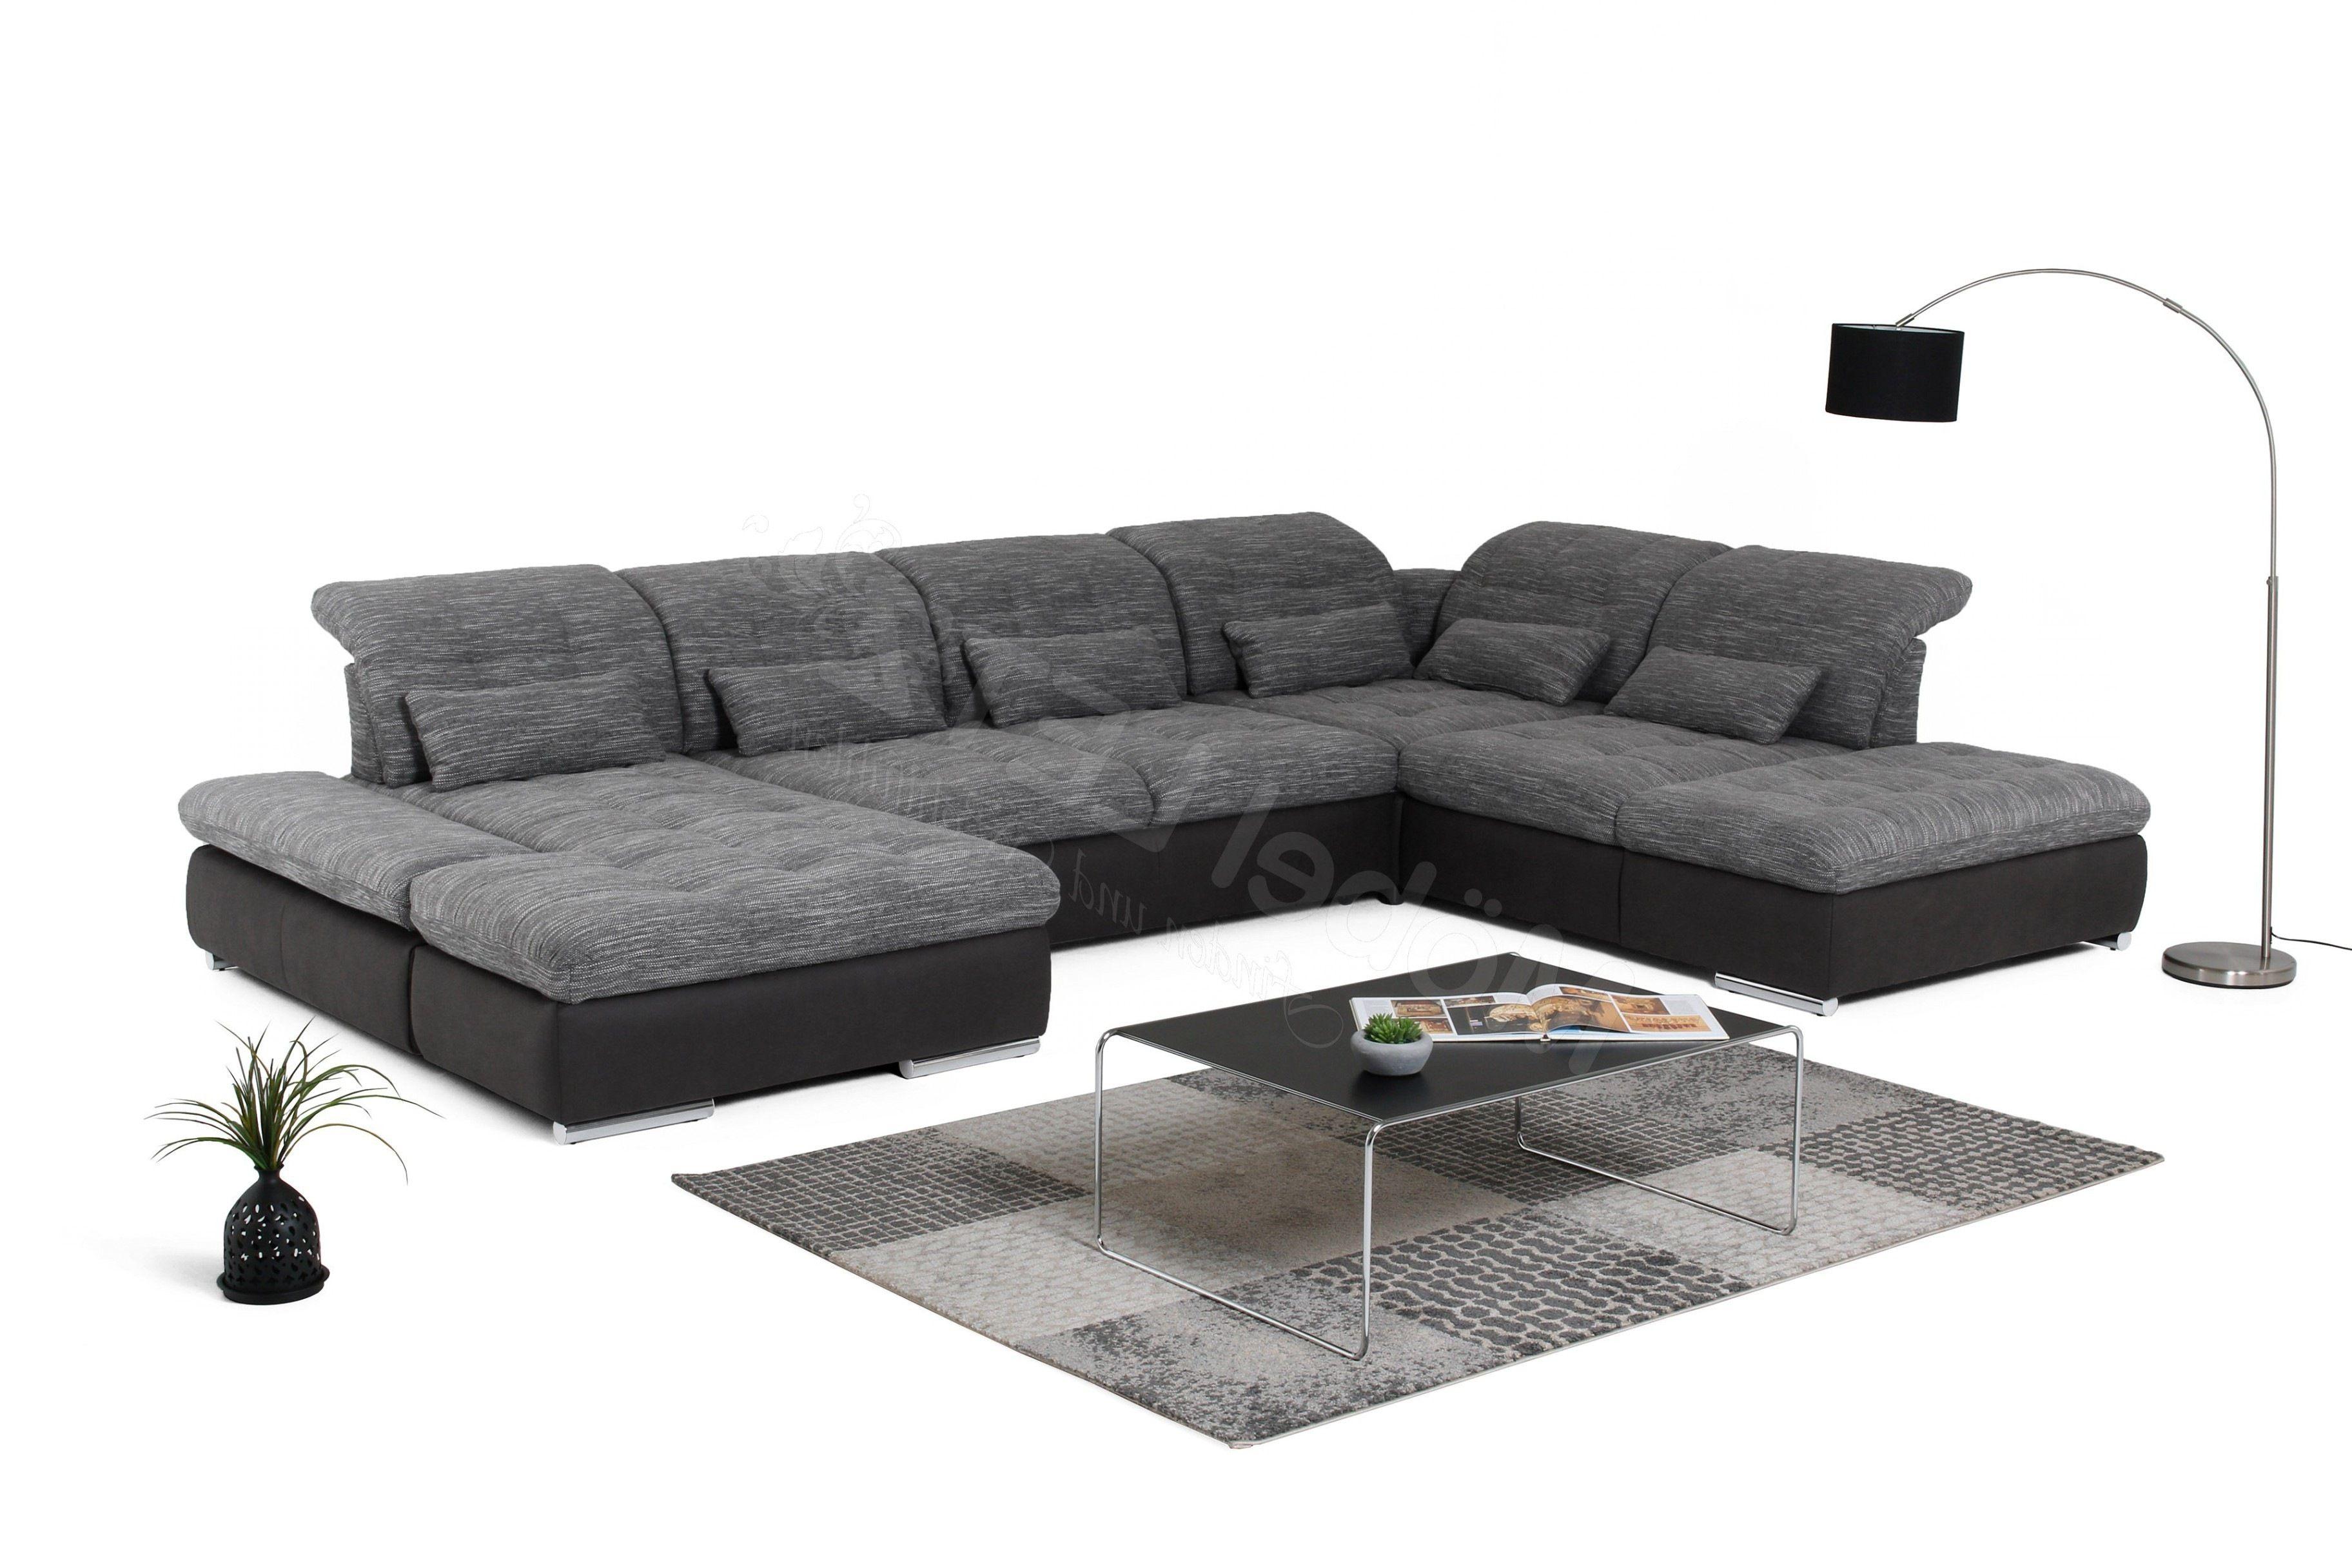 73 Befriedigend Kollektion Von Schlafcouch Poco Modern Couch Couch Sectional Couch